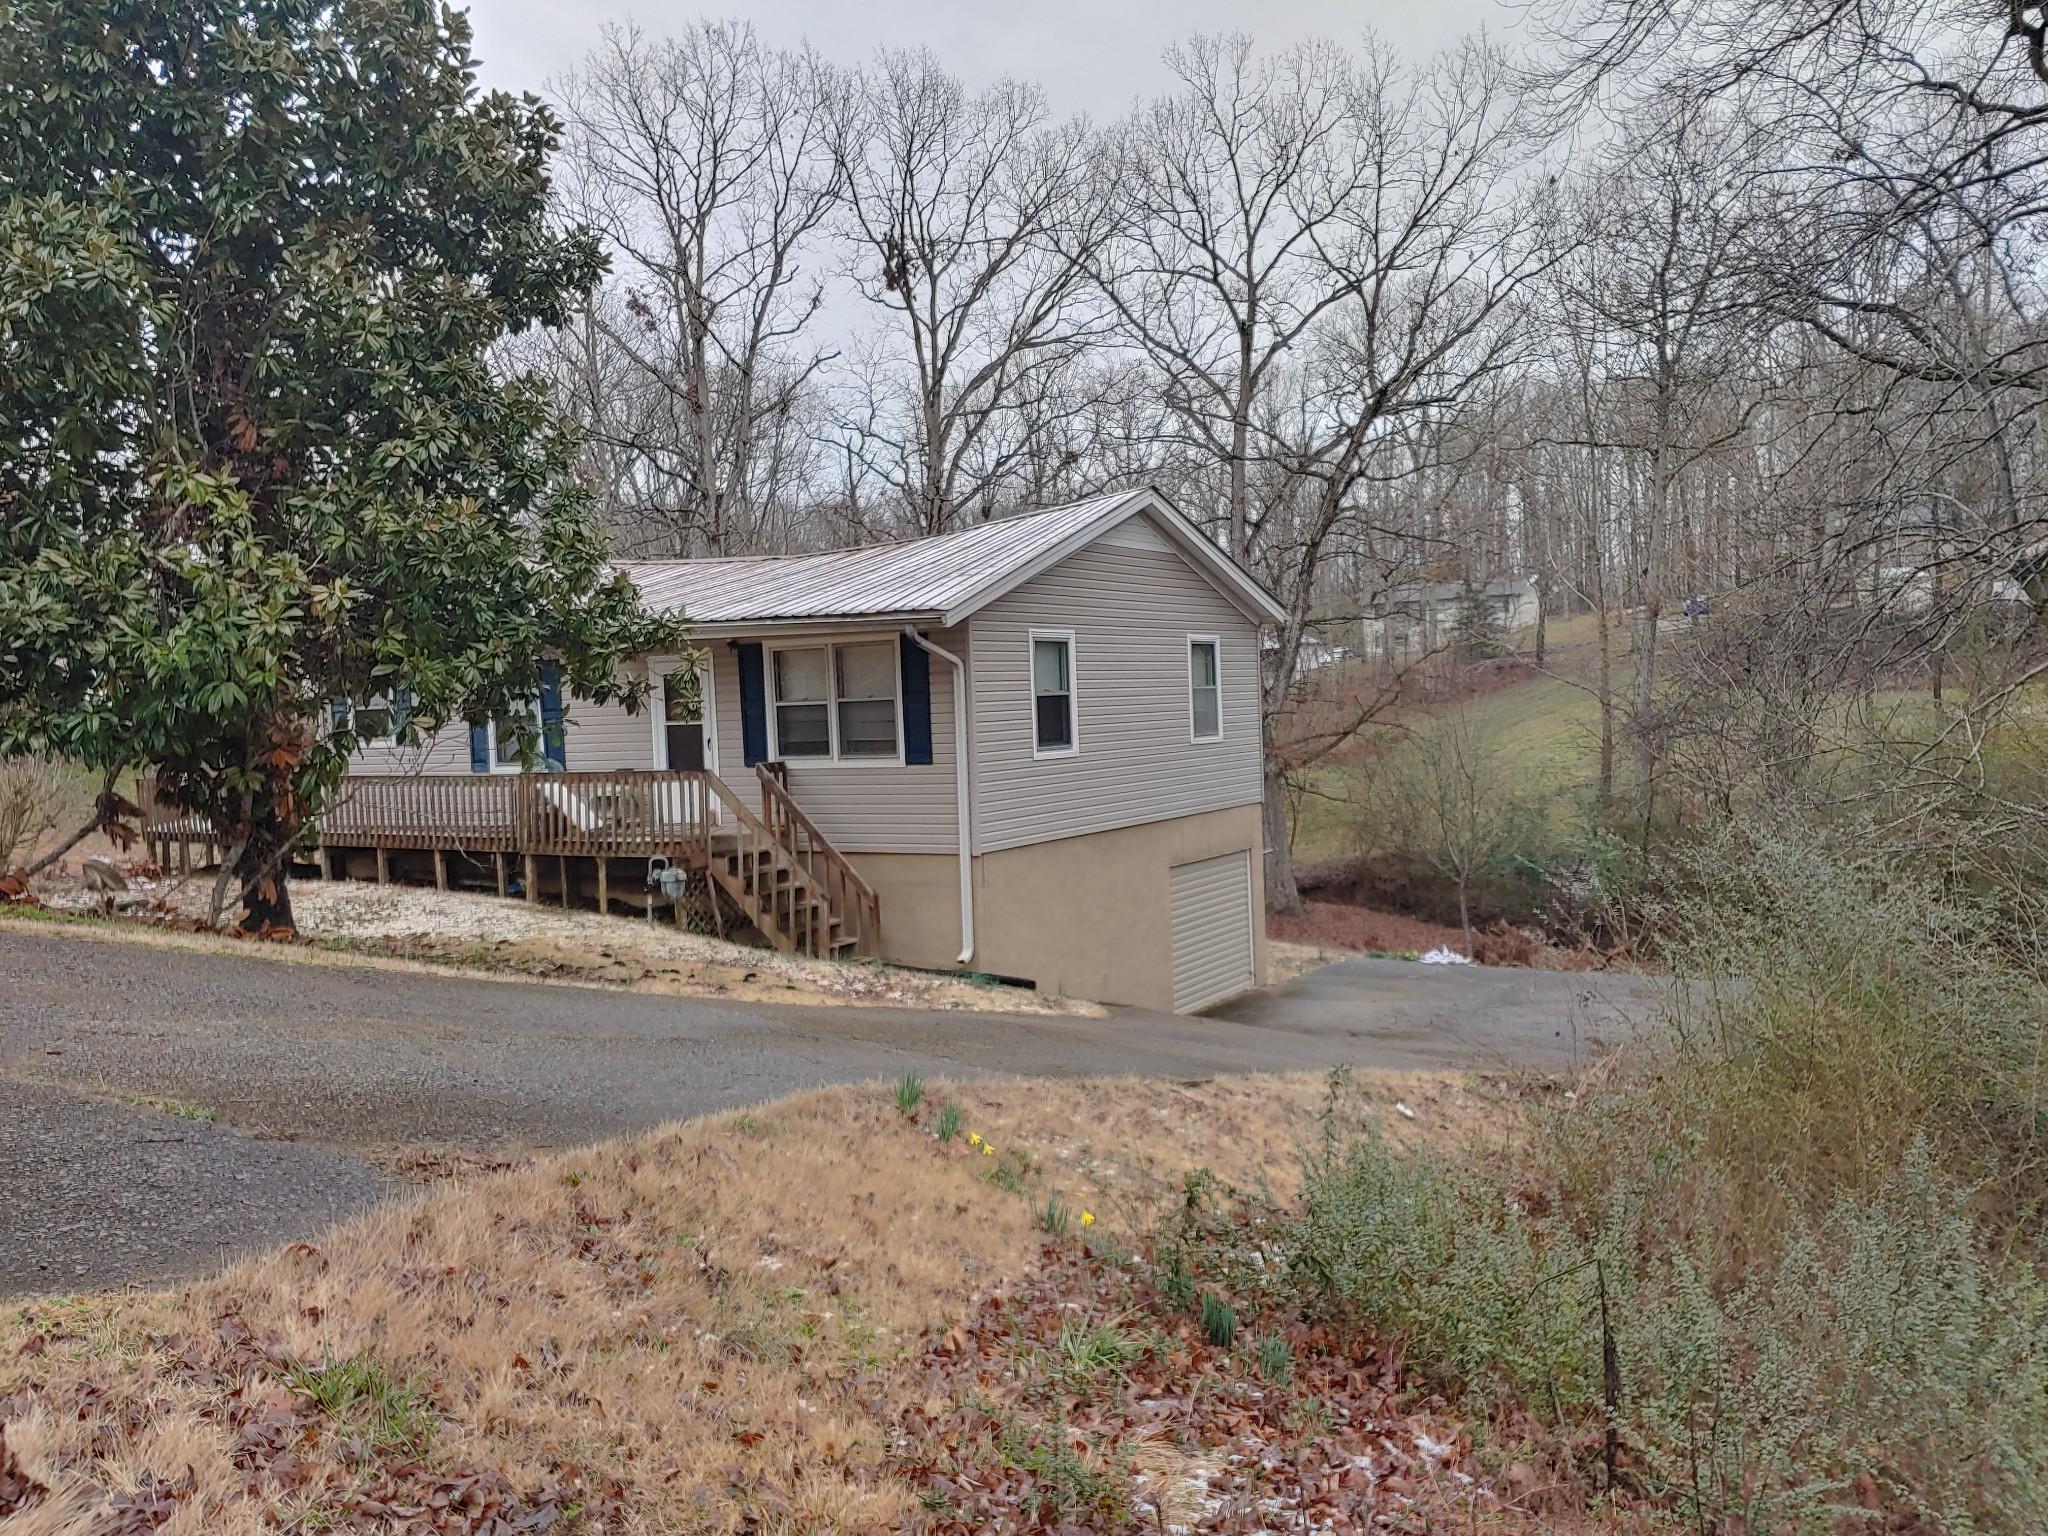 109 Crete St, Waverly, TN 37185 - Waverly, TN real estate listing